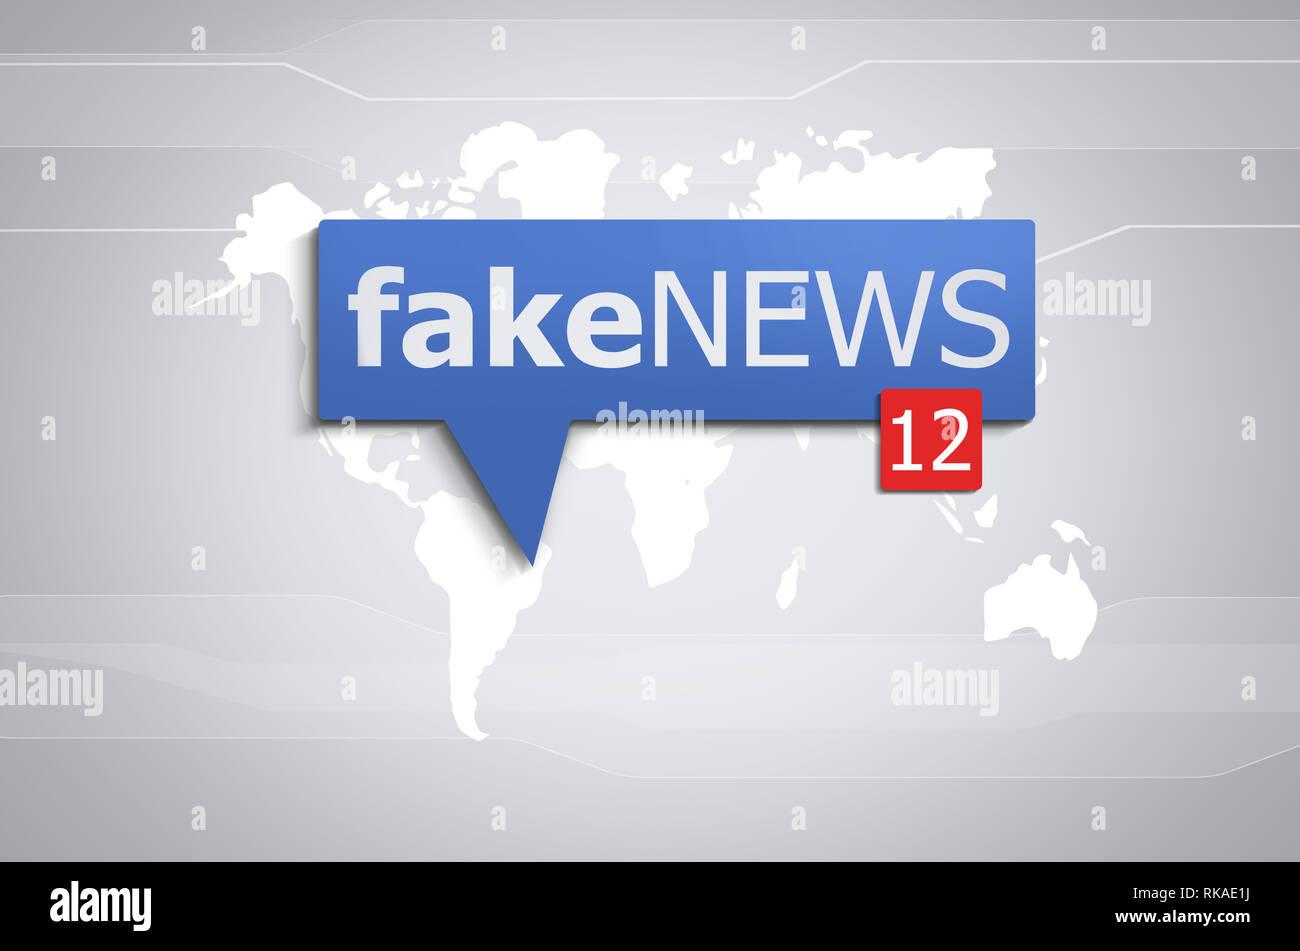 Fake news sui social media Immagini Stock